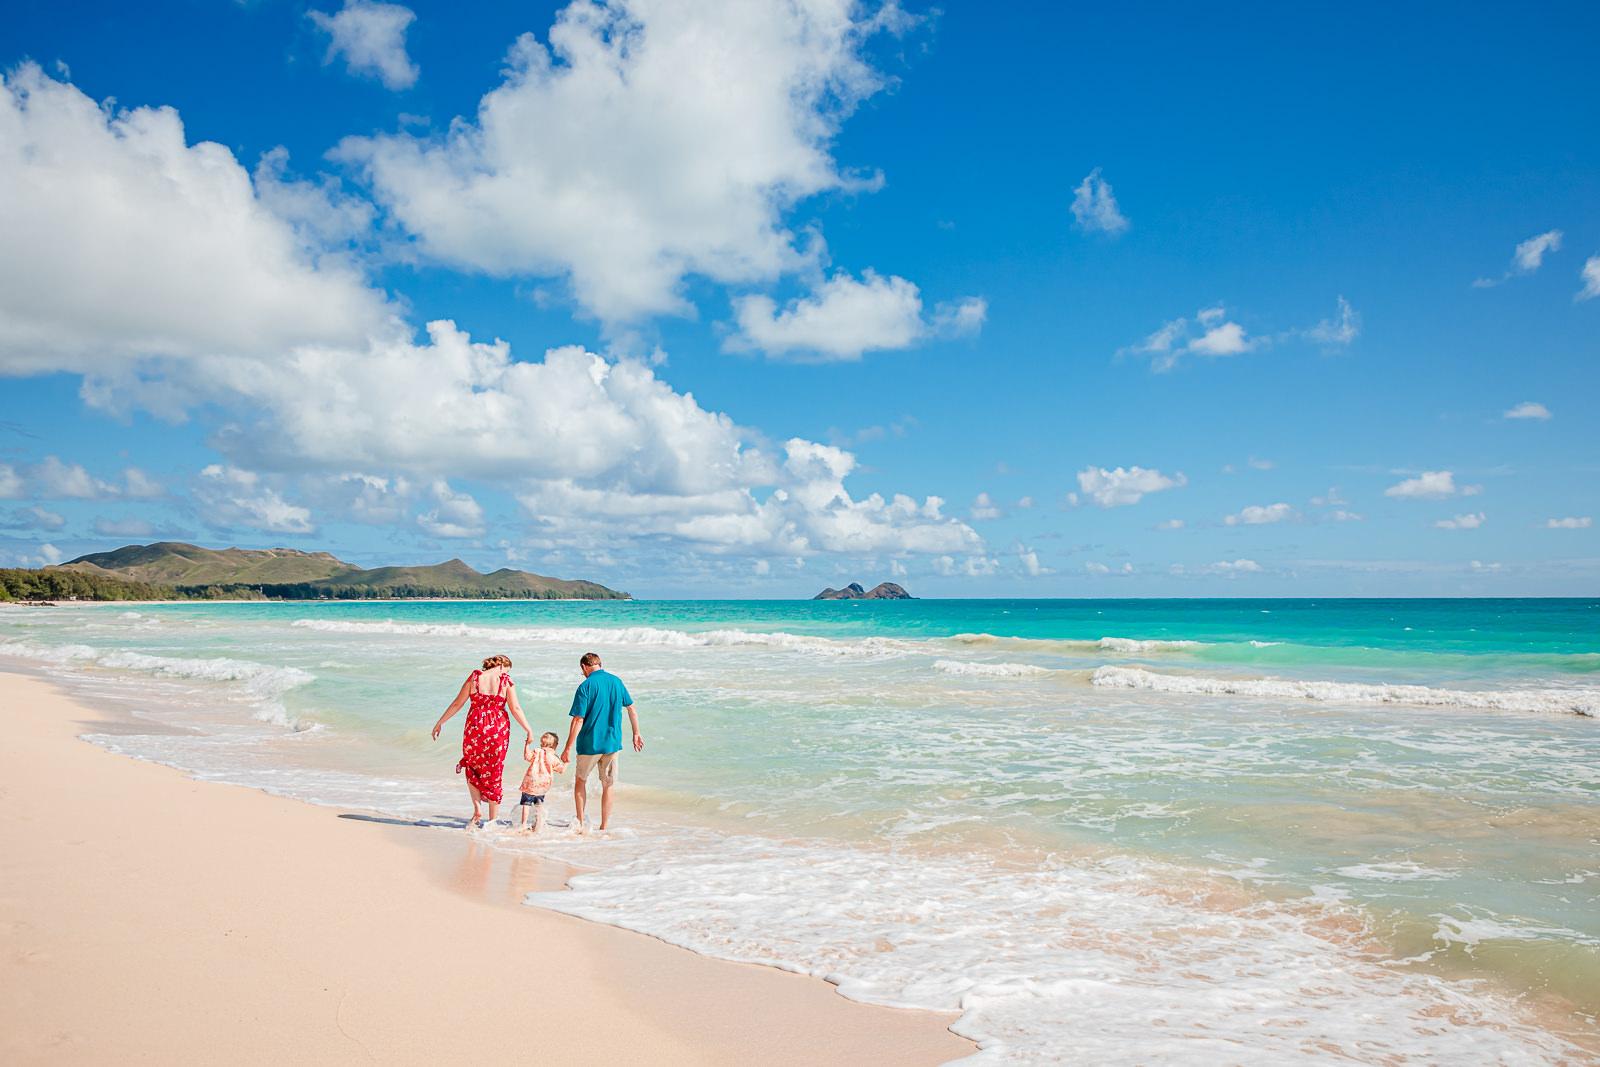 Oahu2019-8799.jpg